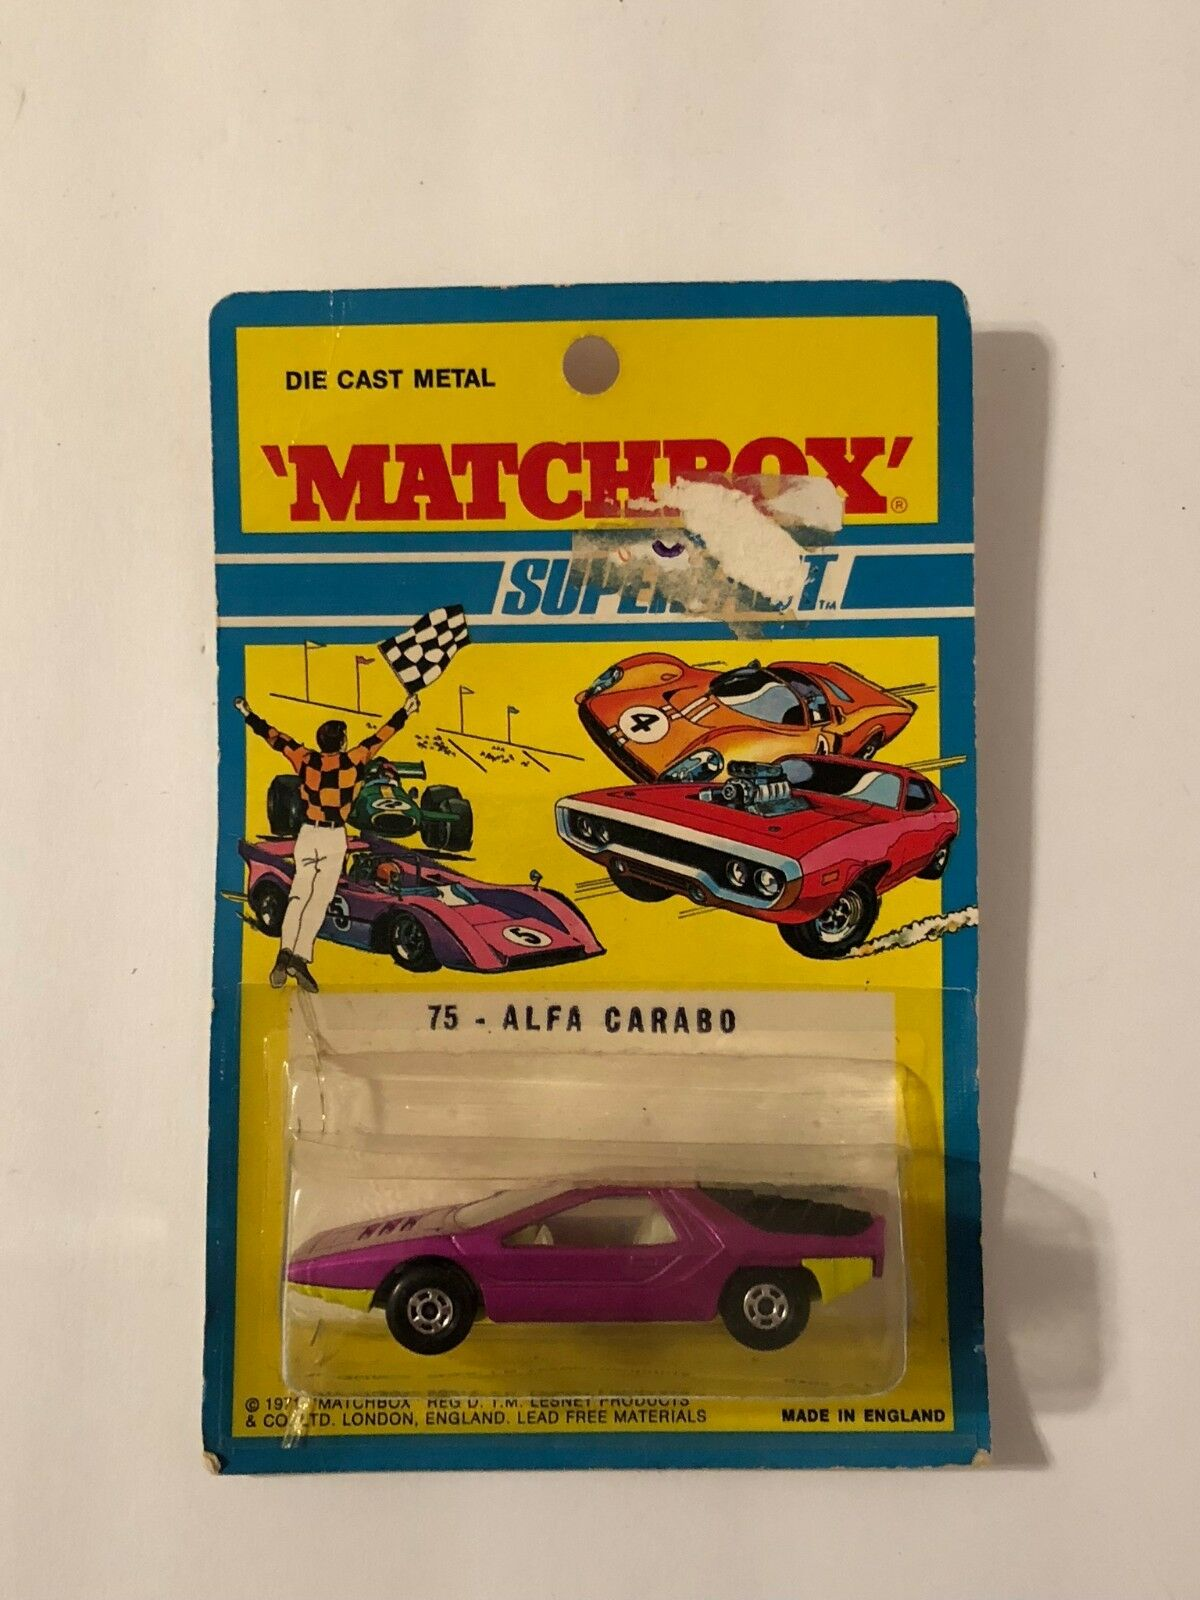 la mejor selección de Matchbox súperfast 75 Alfa Cocheabo 1971 Blister Nuevo Sellado Blisterpack Blisterpack Blisterpack  de moda